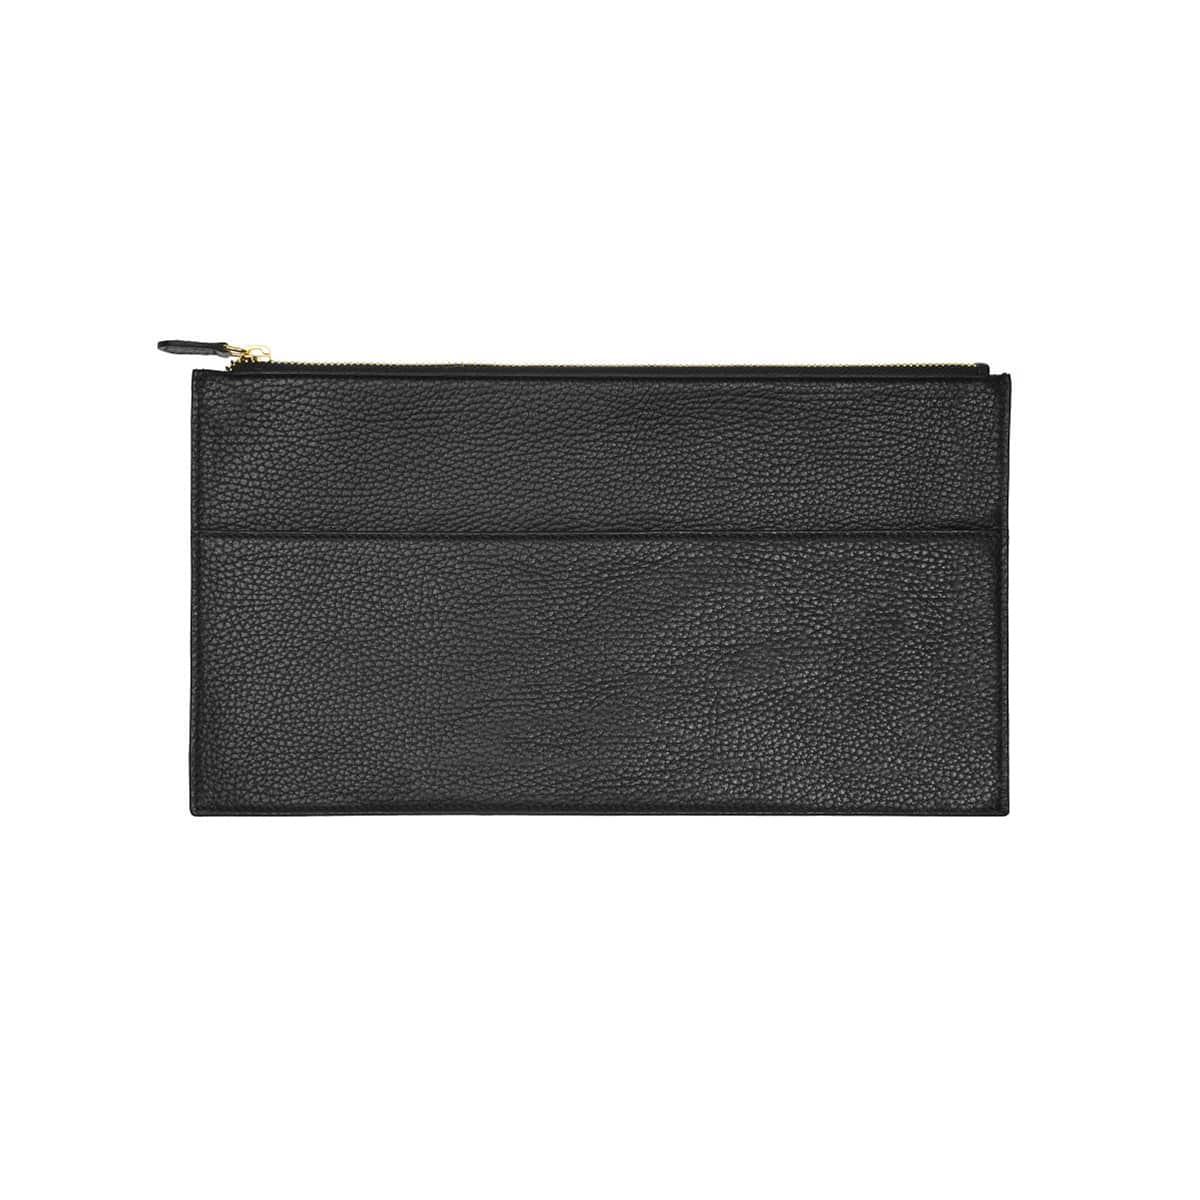 handmade pochette plate cuir coralie de seynes sac L'Erudite Concept Store